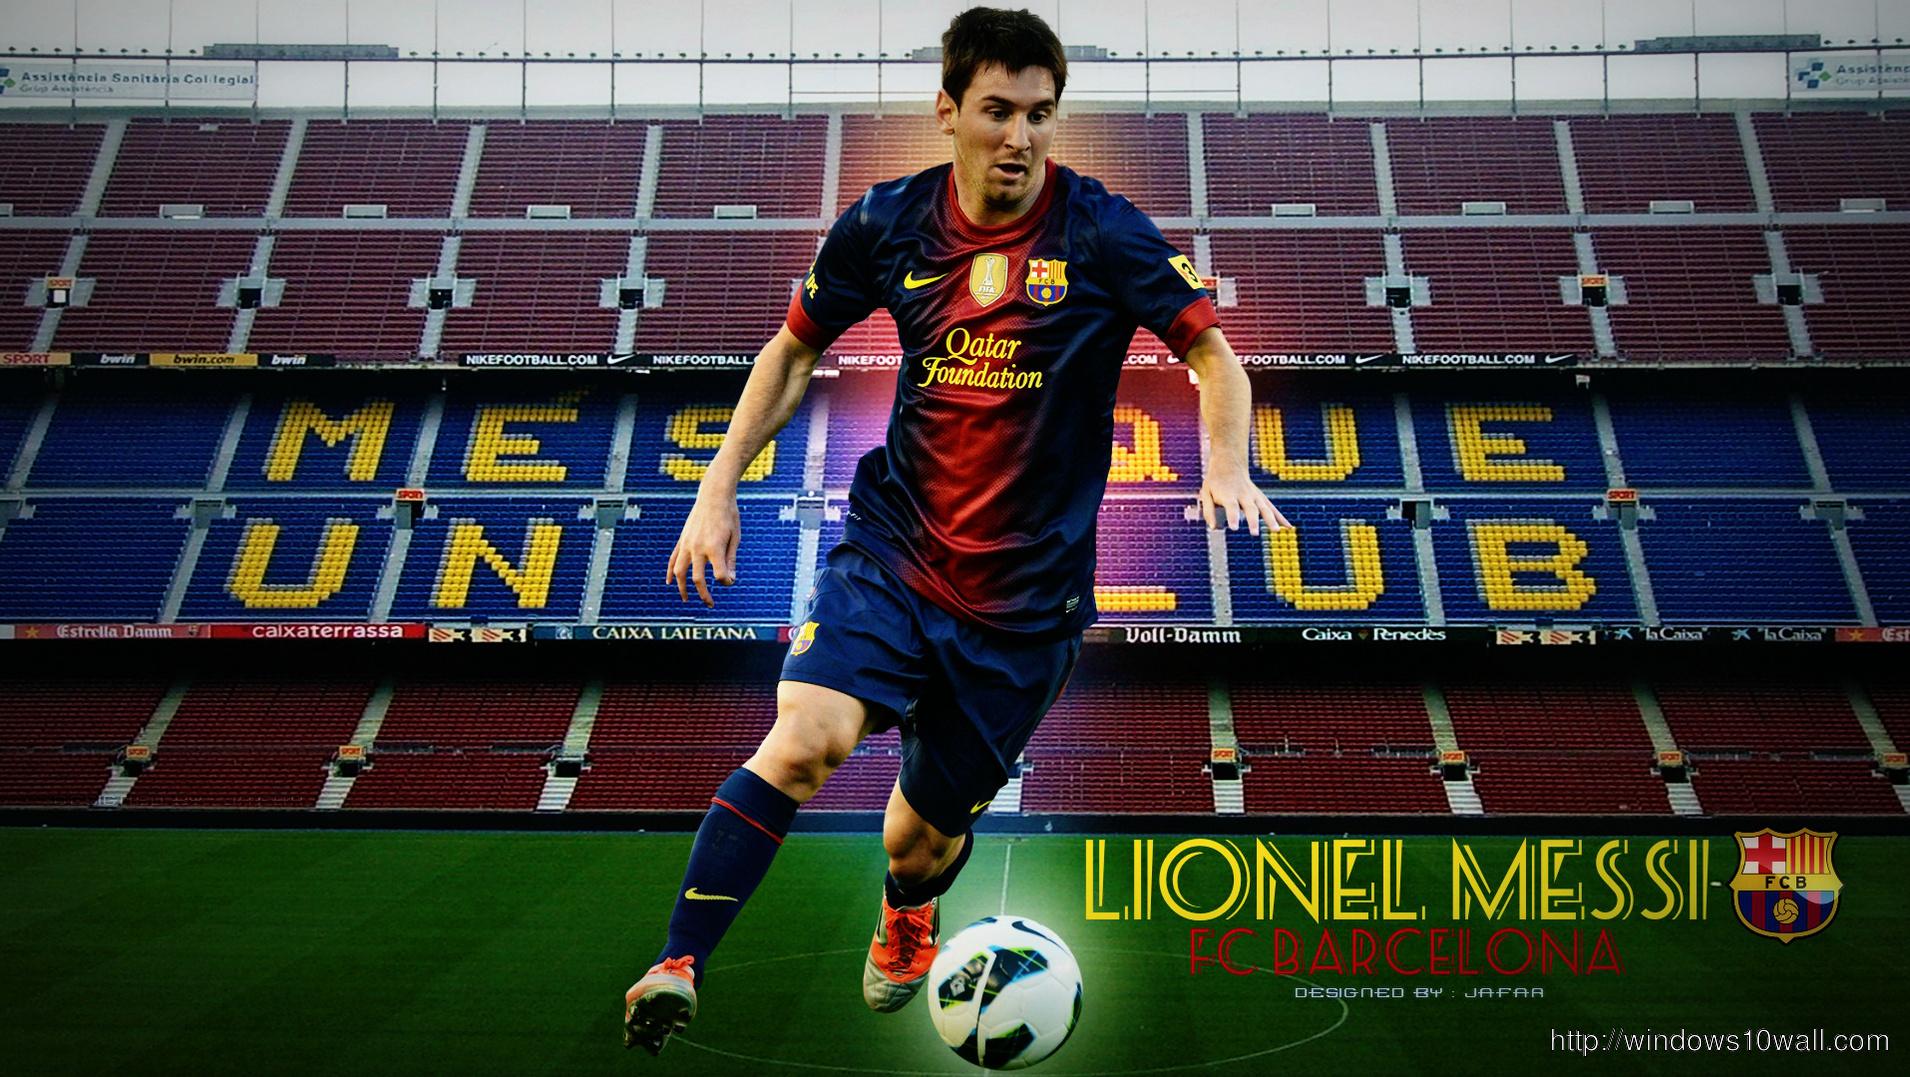 barcelona-lionel-messi-2013-wallpaper